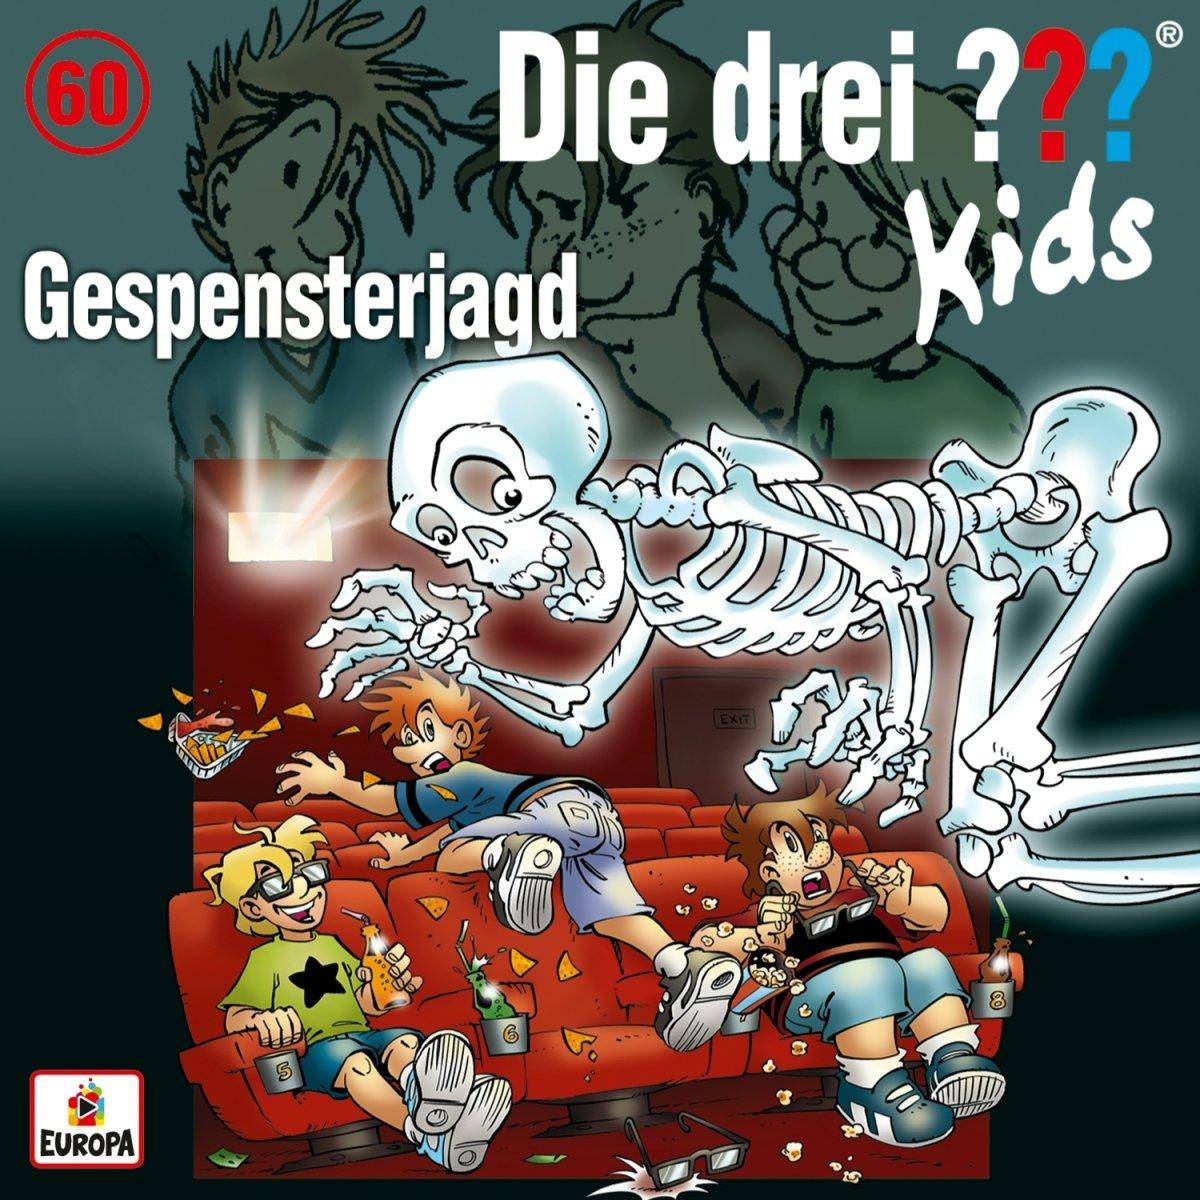 060/Gespensterjagd Europa (Sony Music) Wort Kinderhörspiele Kindermusik & Hörspiele / Hörspiele